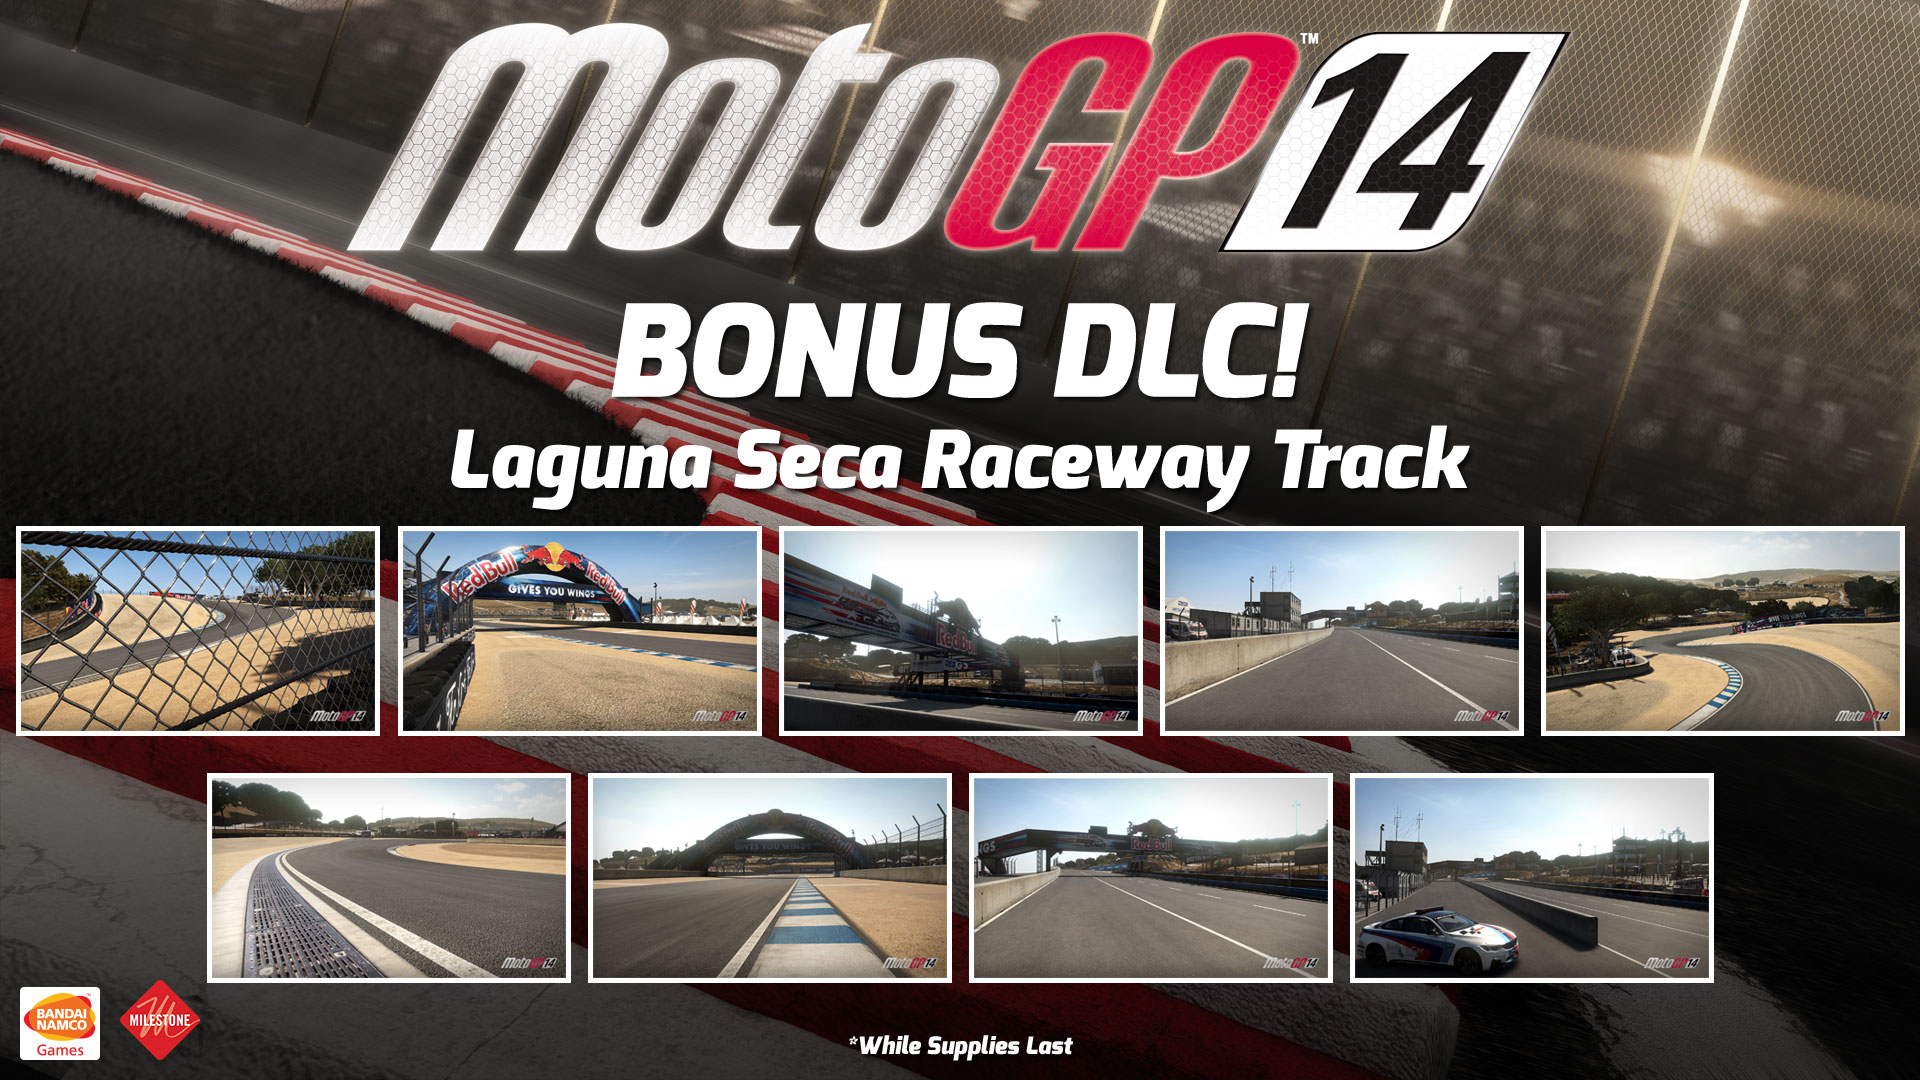 MotoGP and MXGP to get bonus DLC for GameStop/EBGames buyers | Brutal Gamer